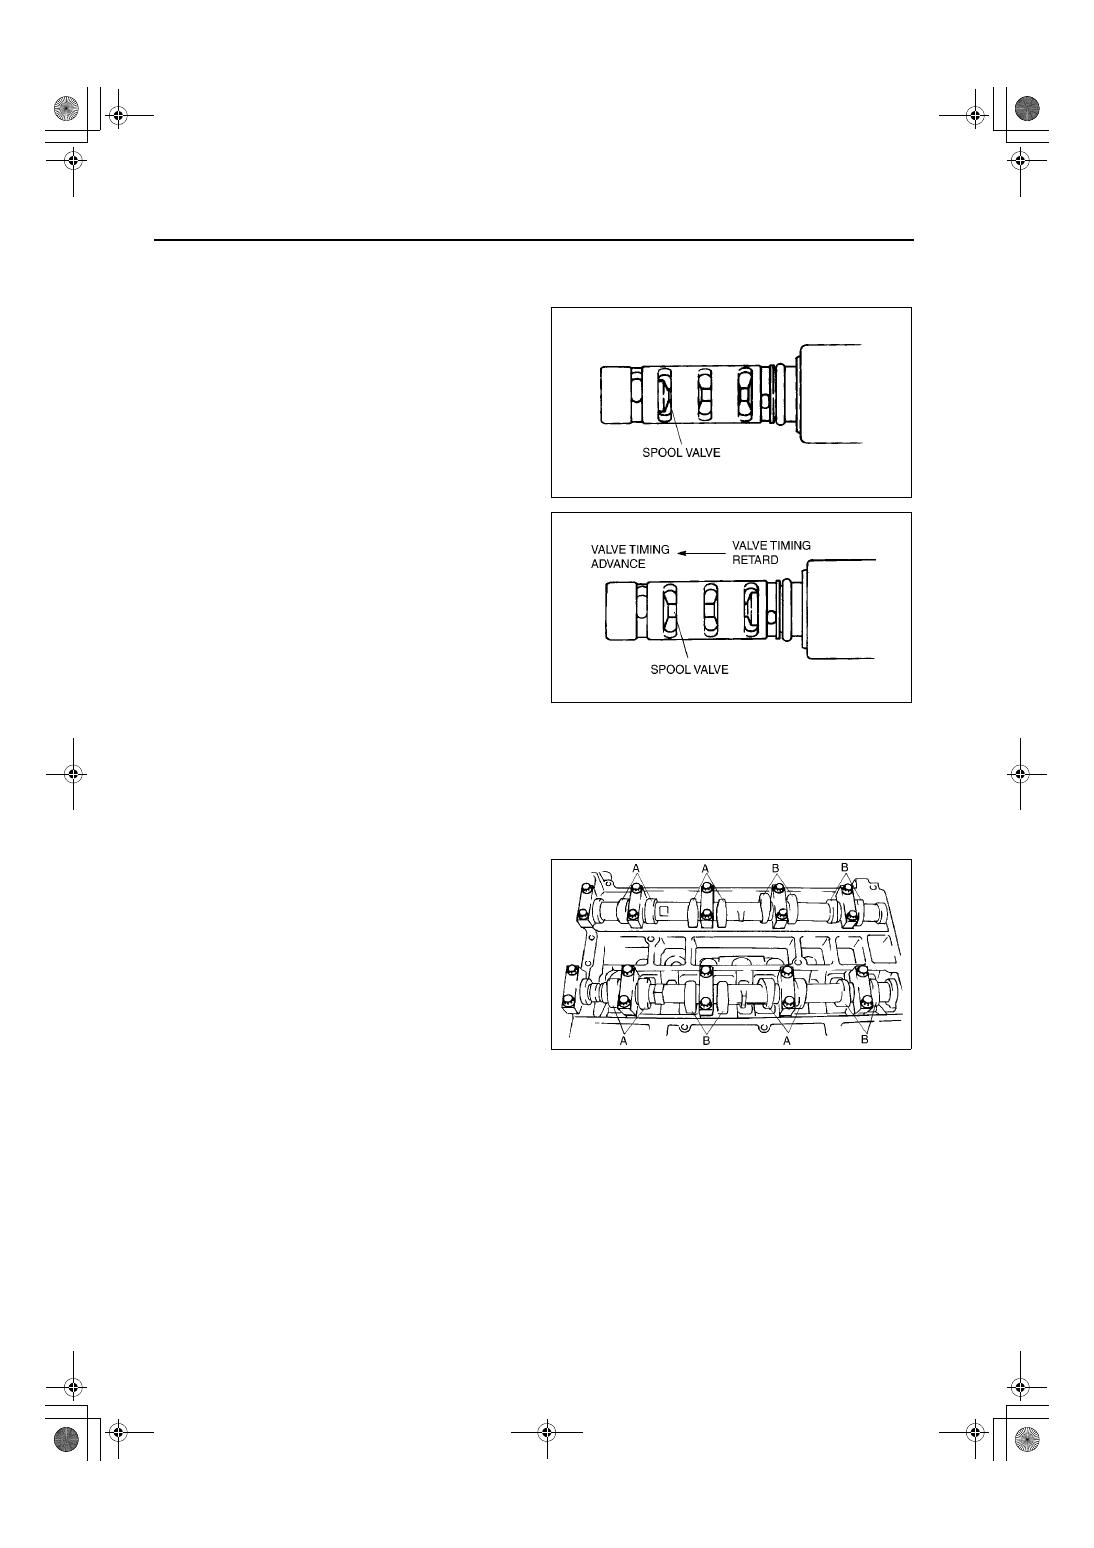 Mazda Engine L8 Lf L3 Manual Part 11 Valve Timing Diagram